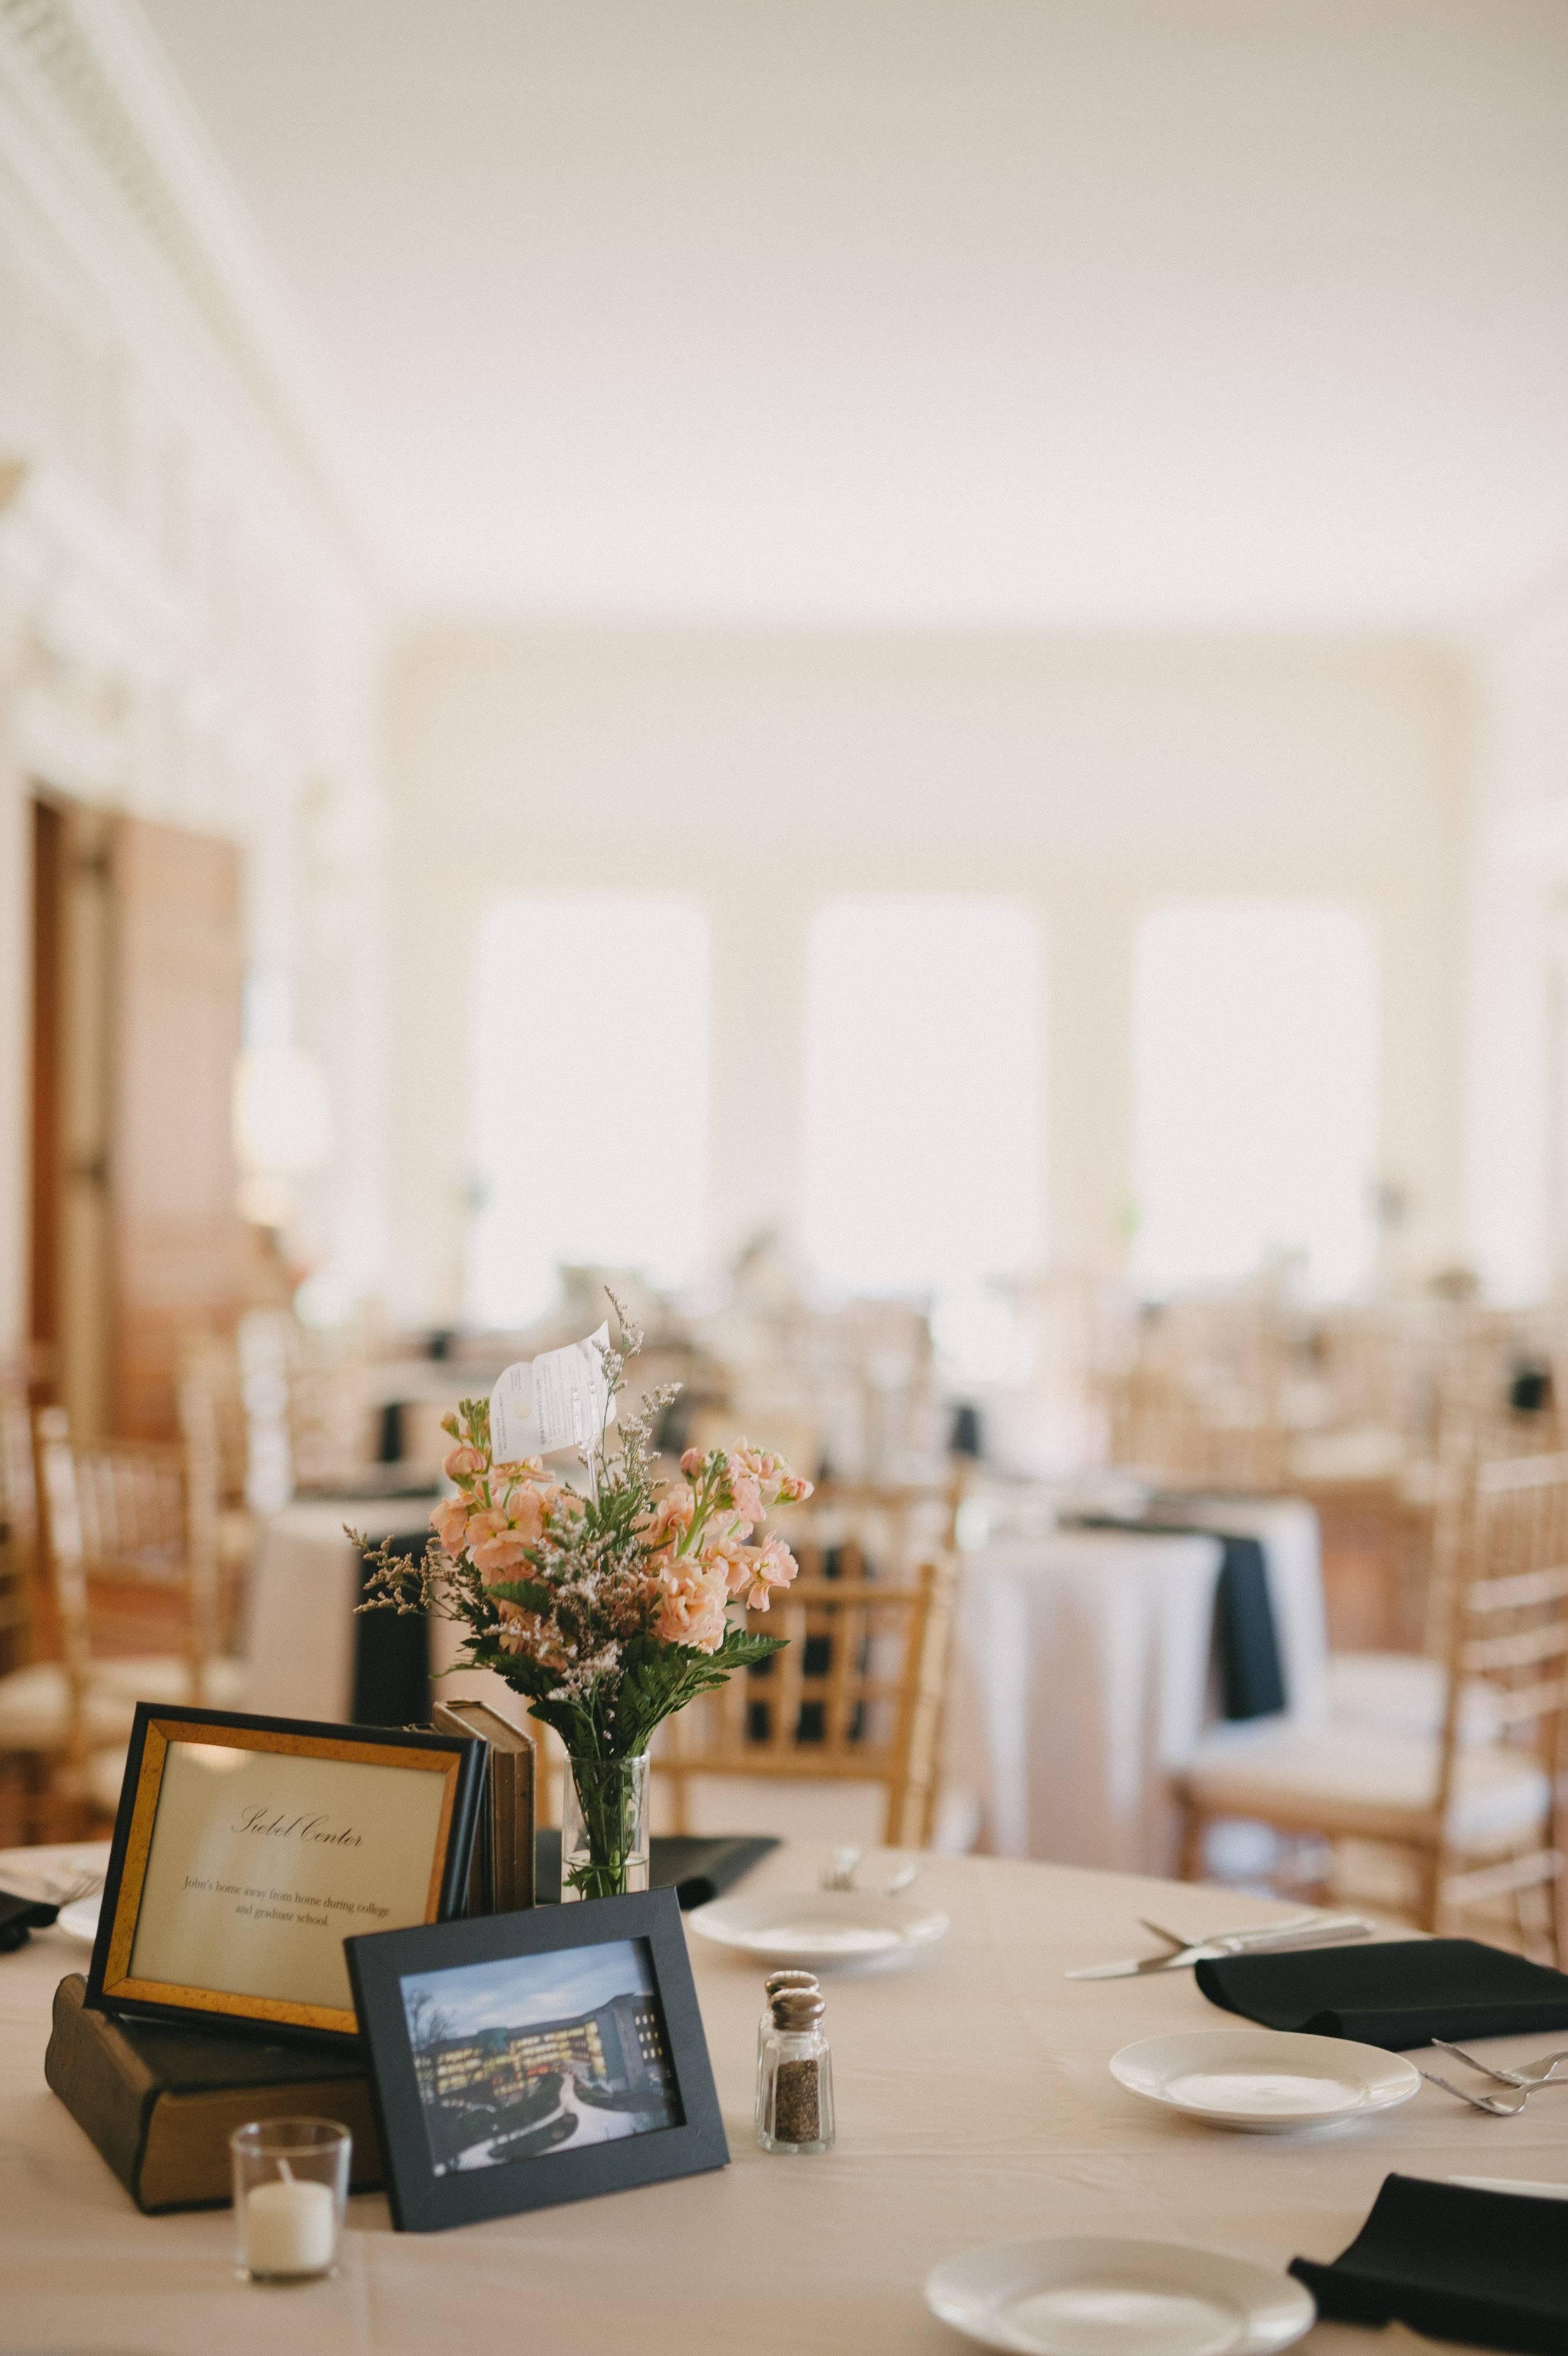 Throw a Library-Themed Wedding